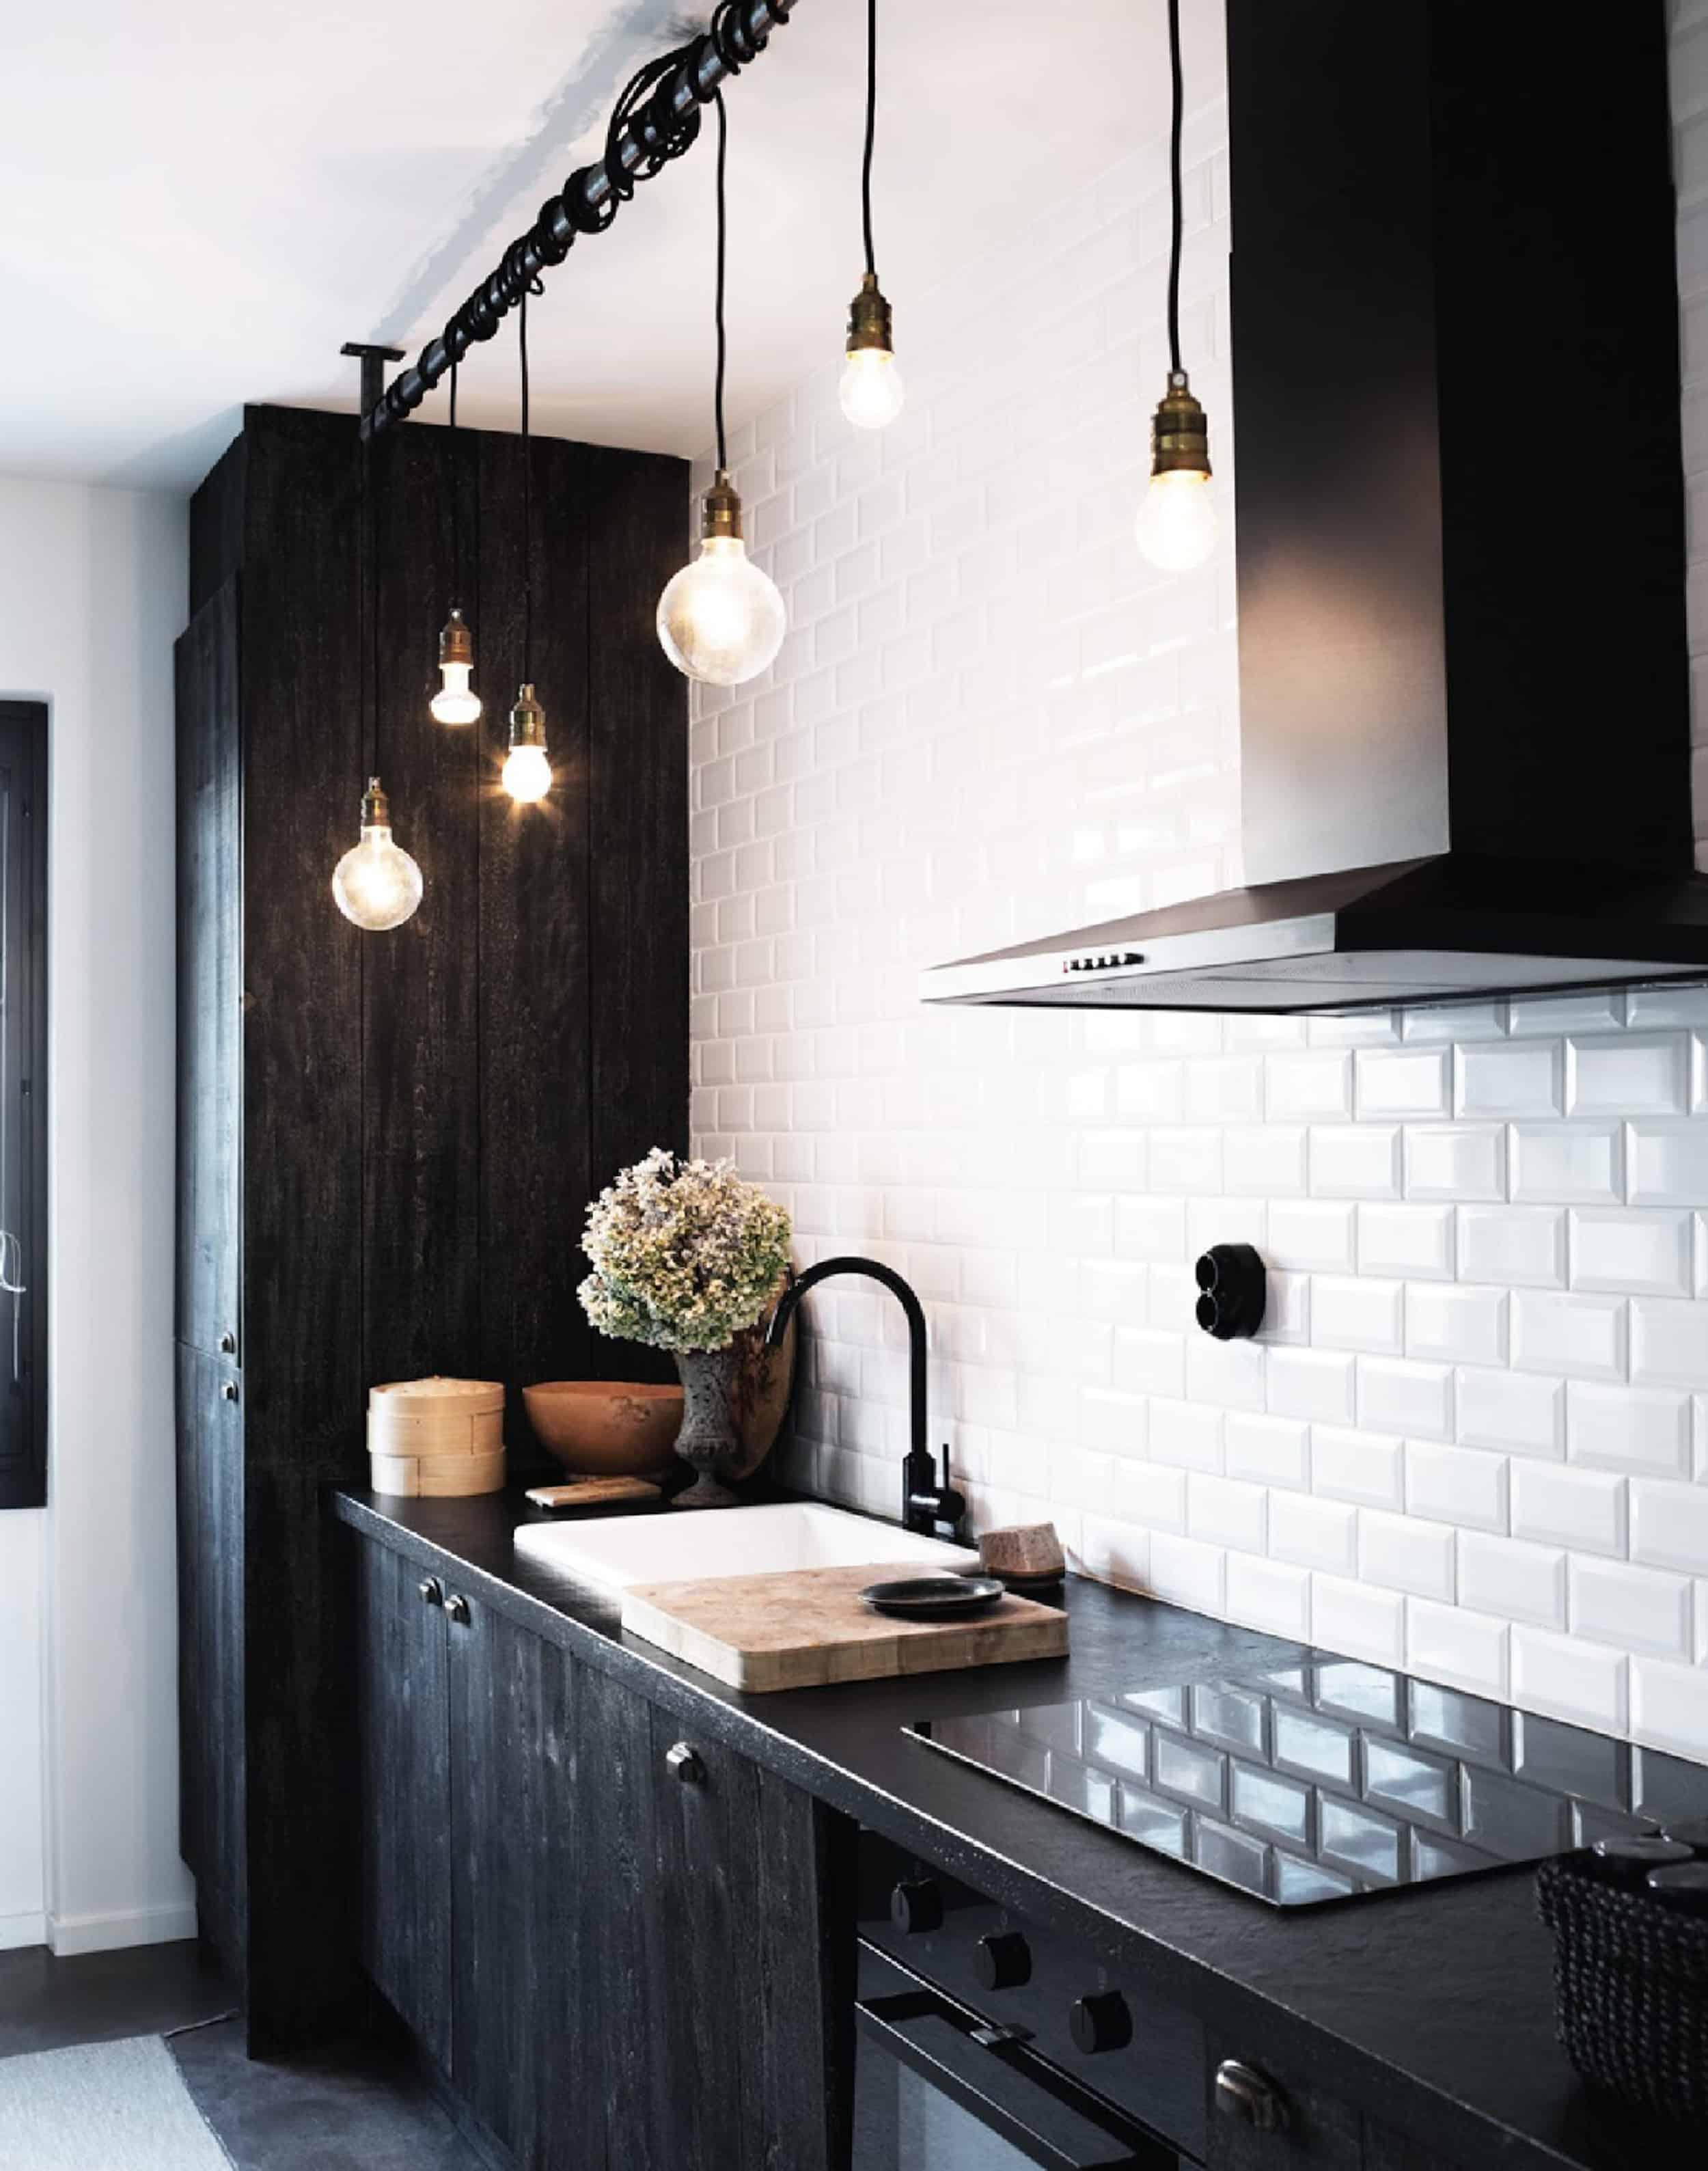 Emily Henderson Mountain Fixer Upper Kitchen I Design You Decide Inspo Pic 4